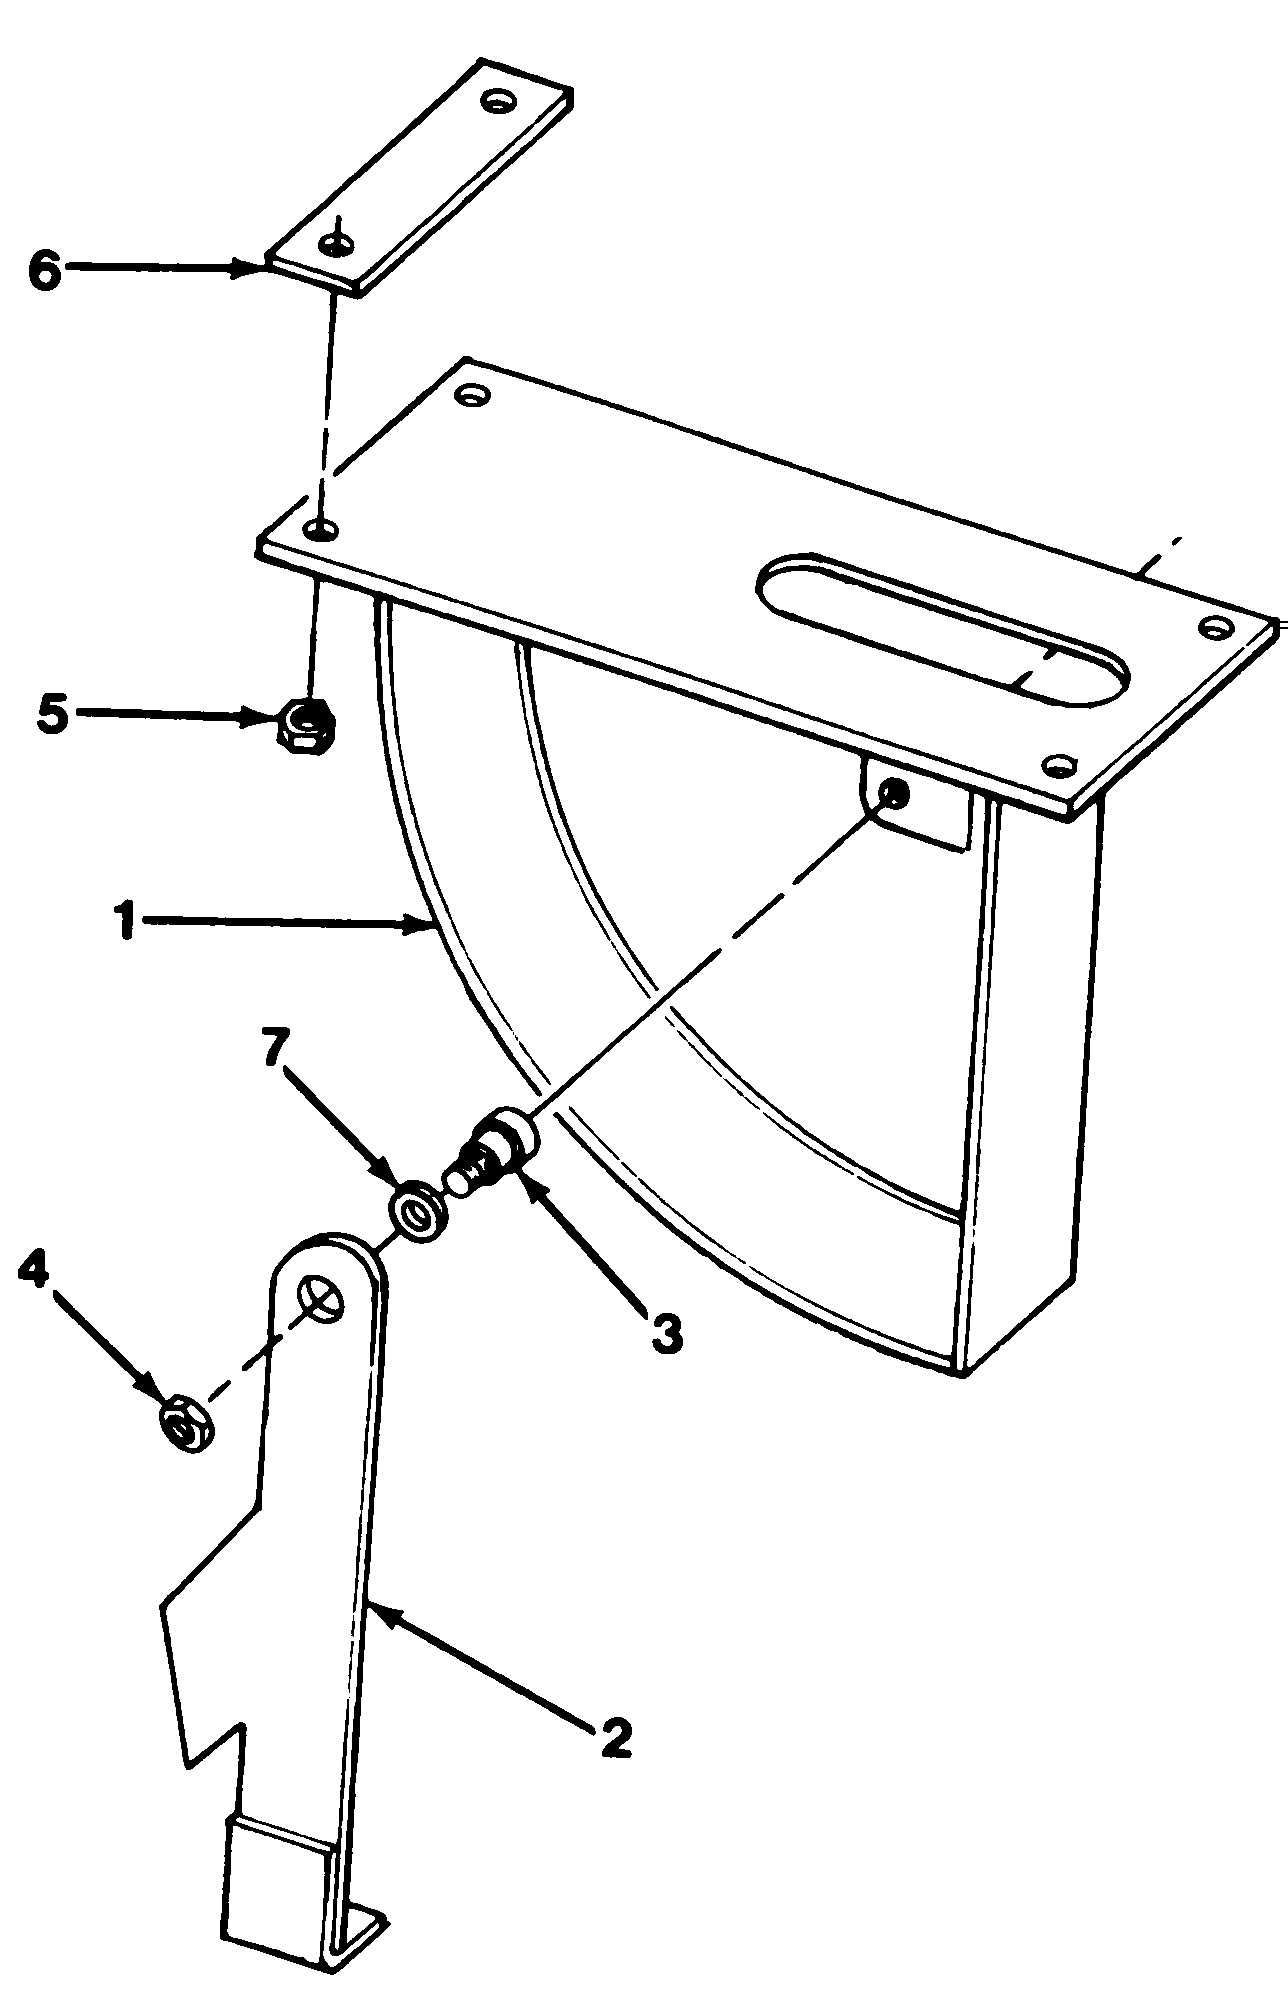 Figure 12-4. Boom Angle Indicator